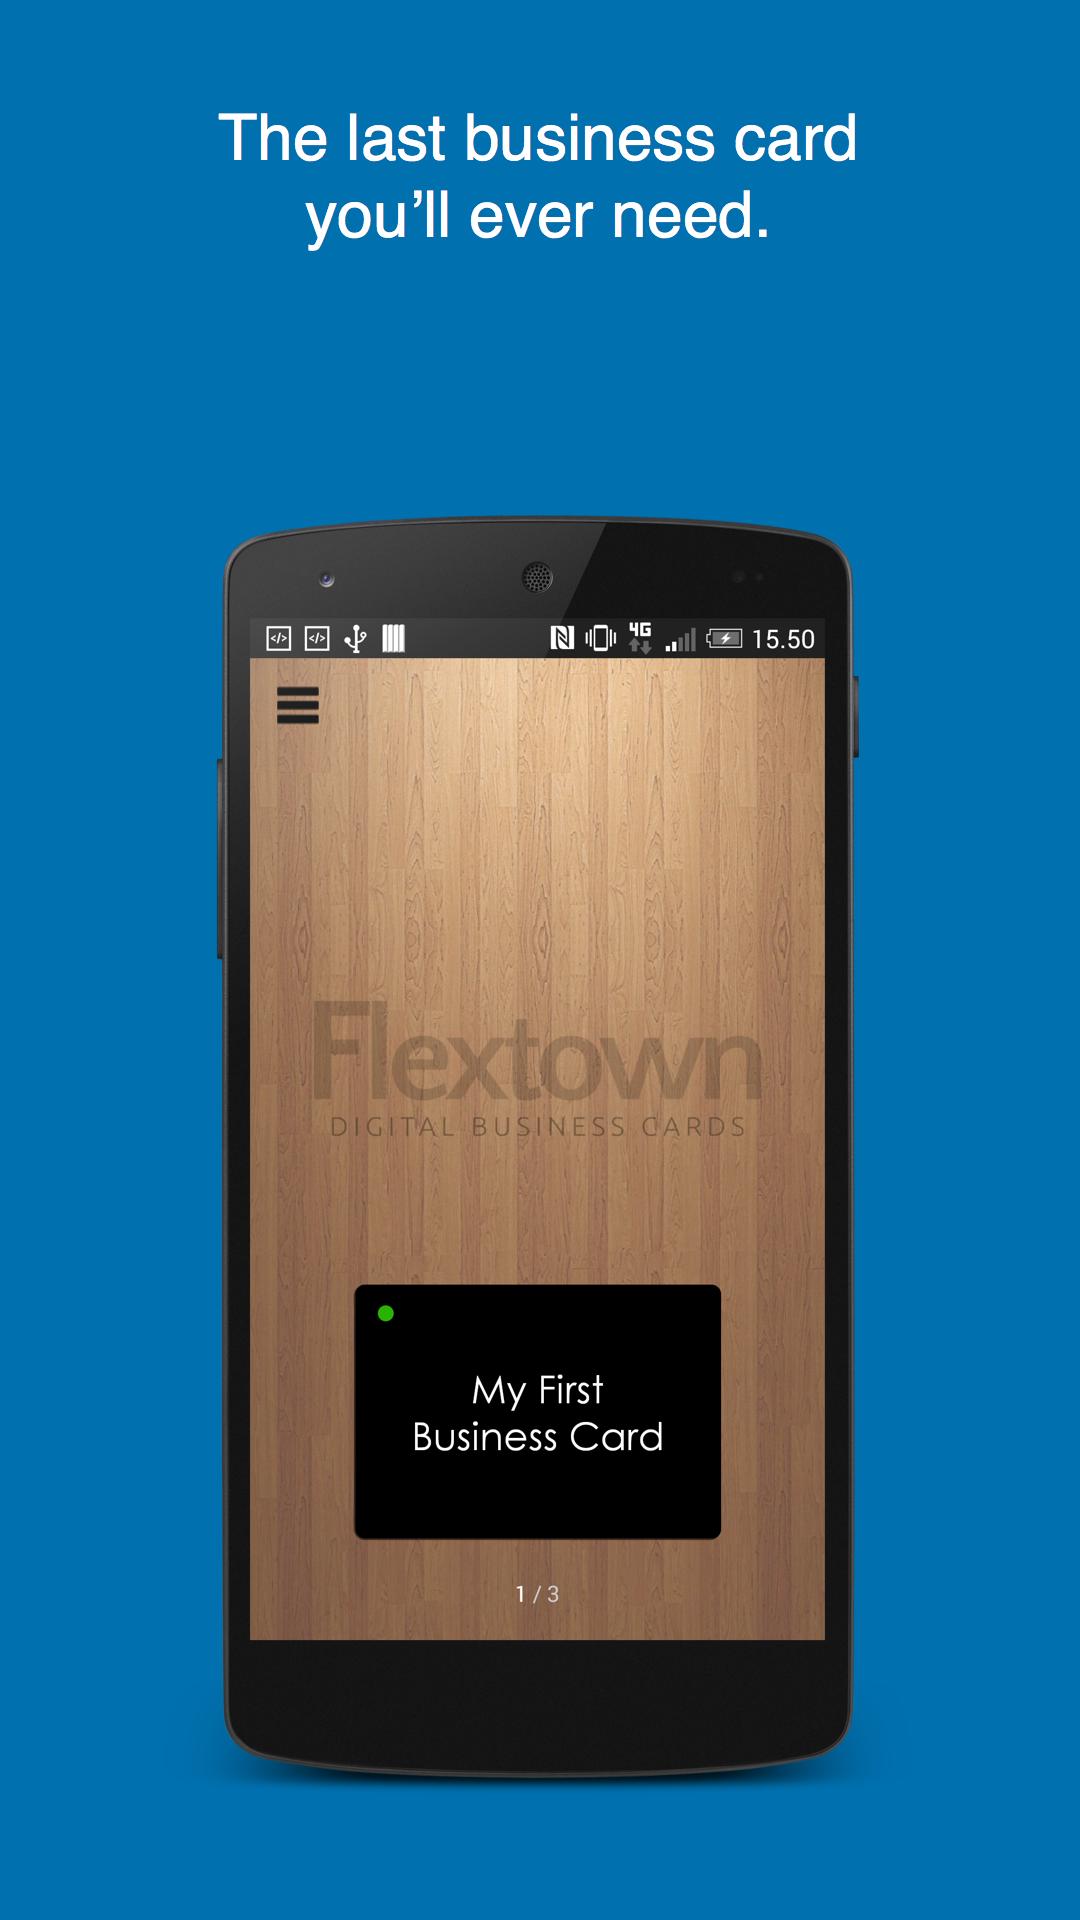 Digital Business Card : Amazon flextown digital business card appstore for